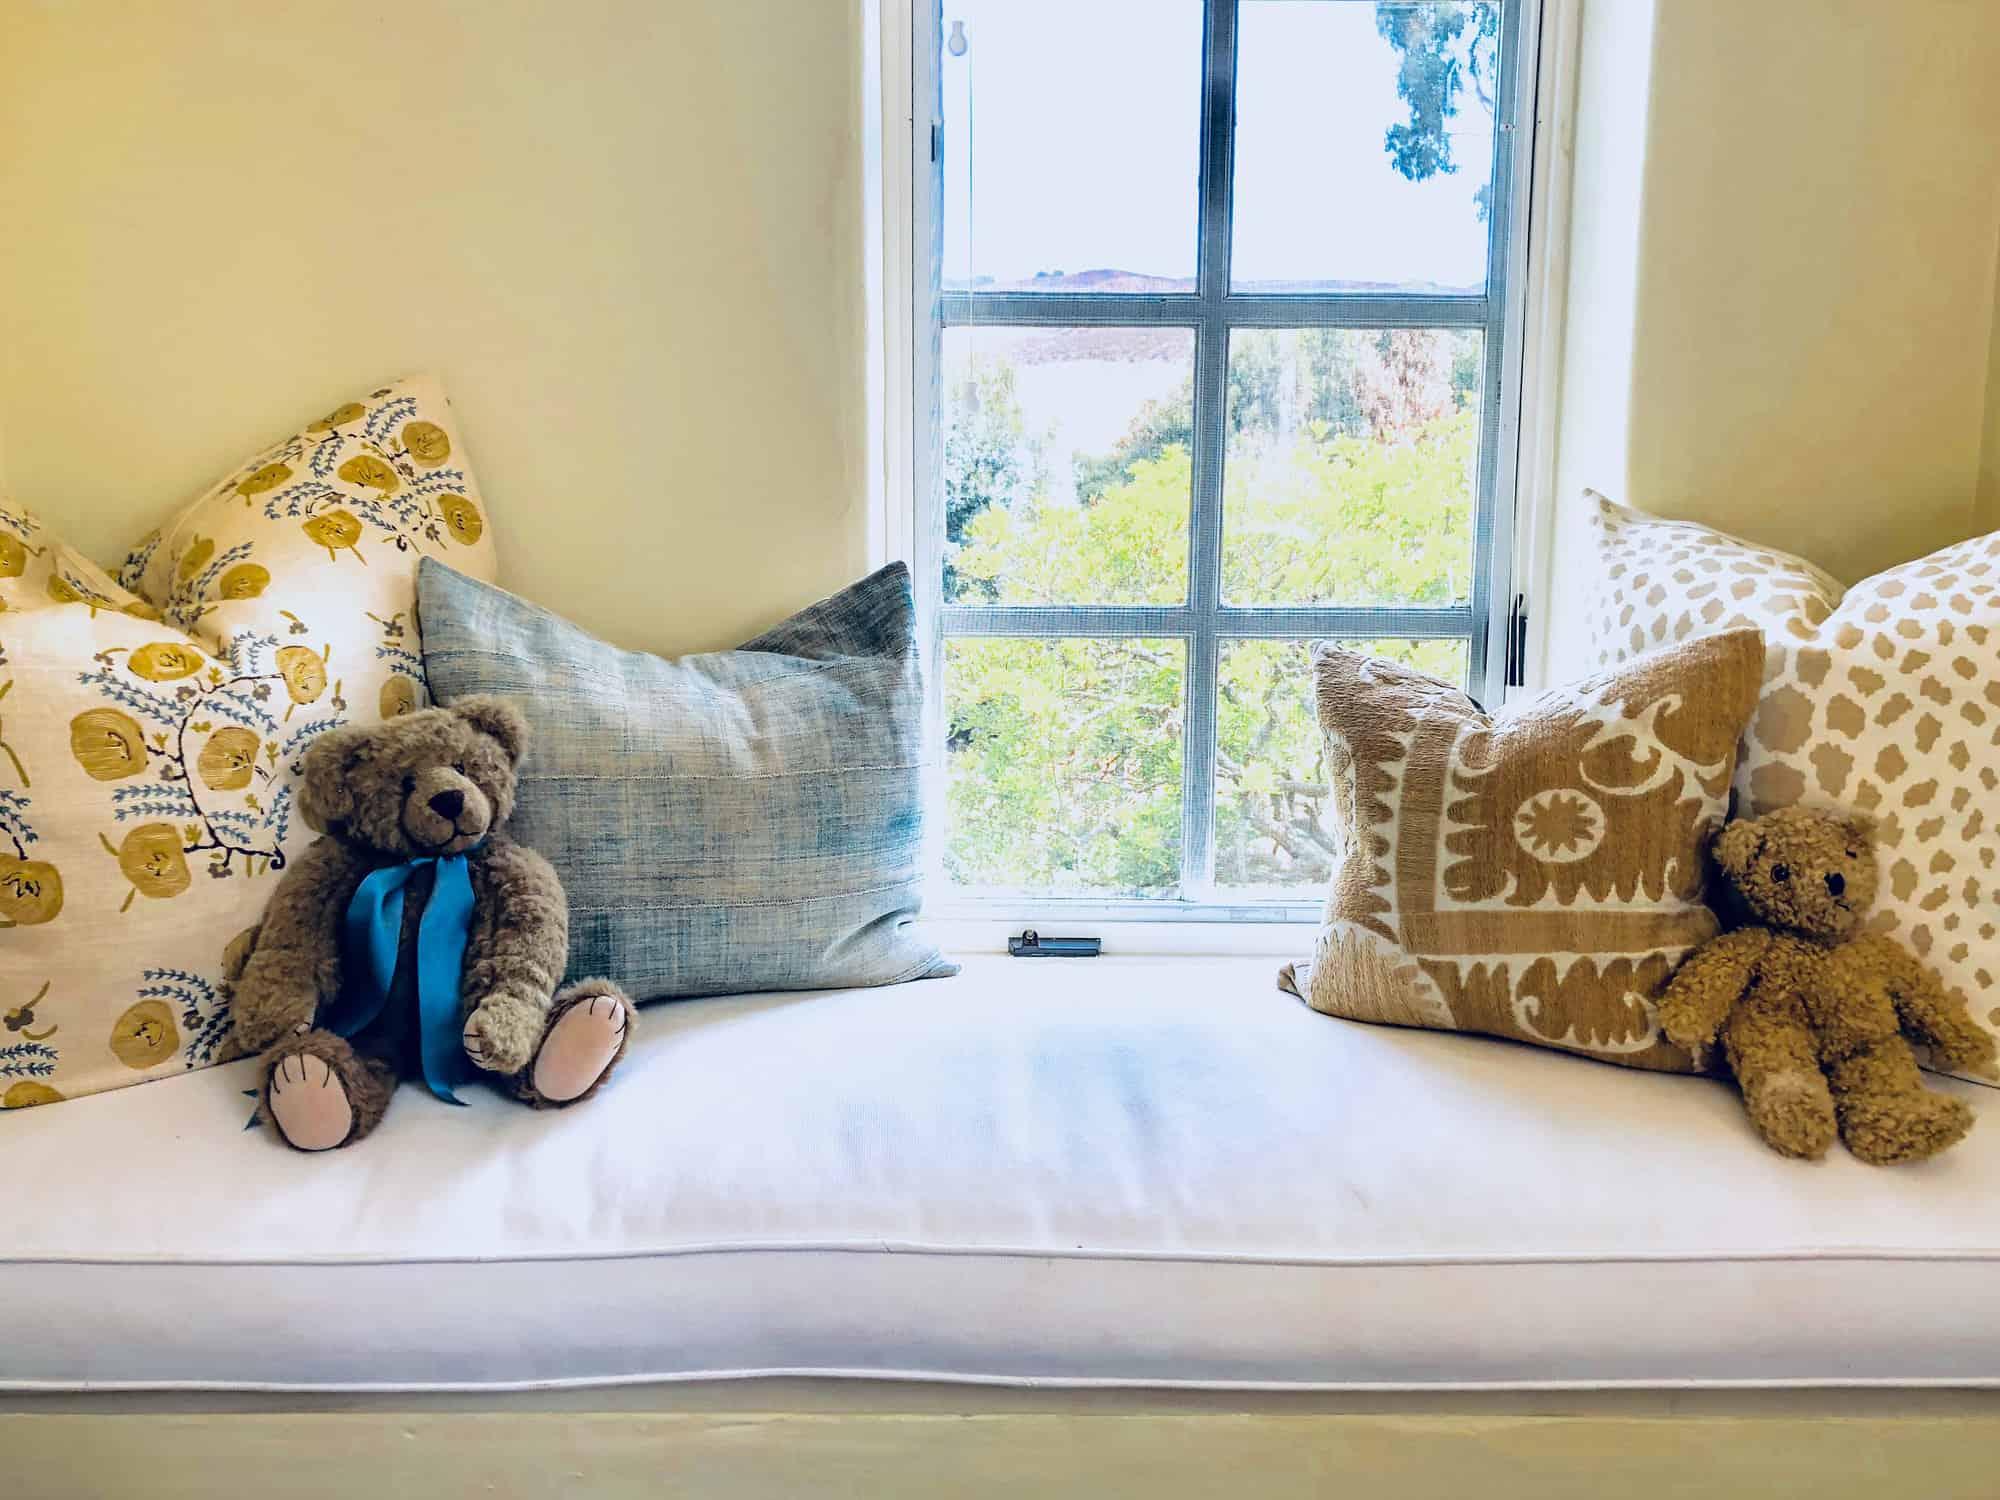 windowseat with bears